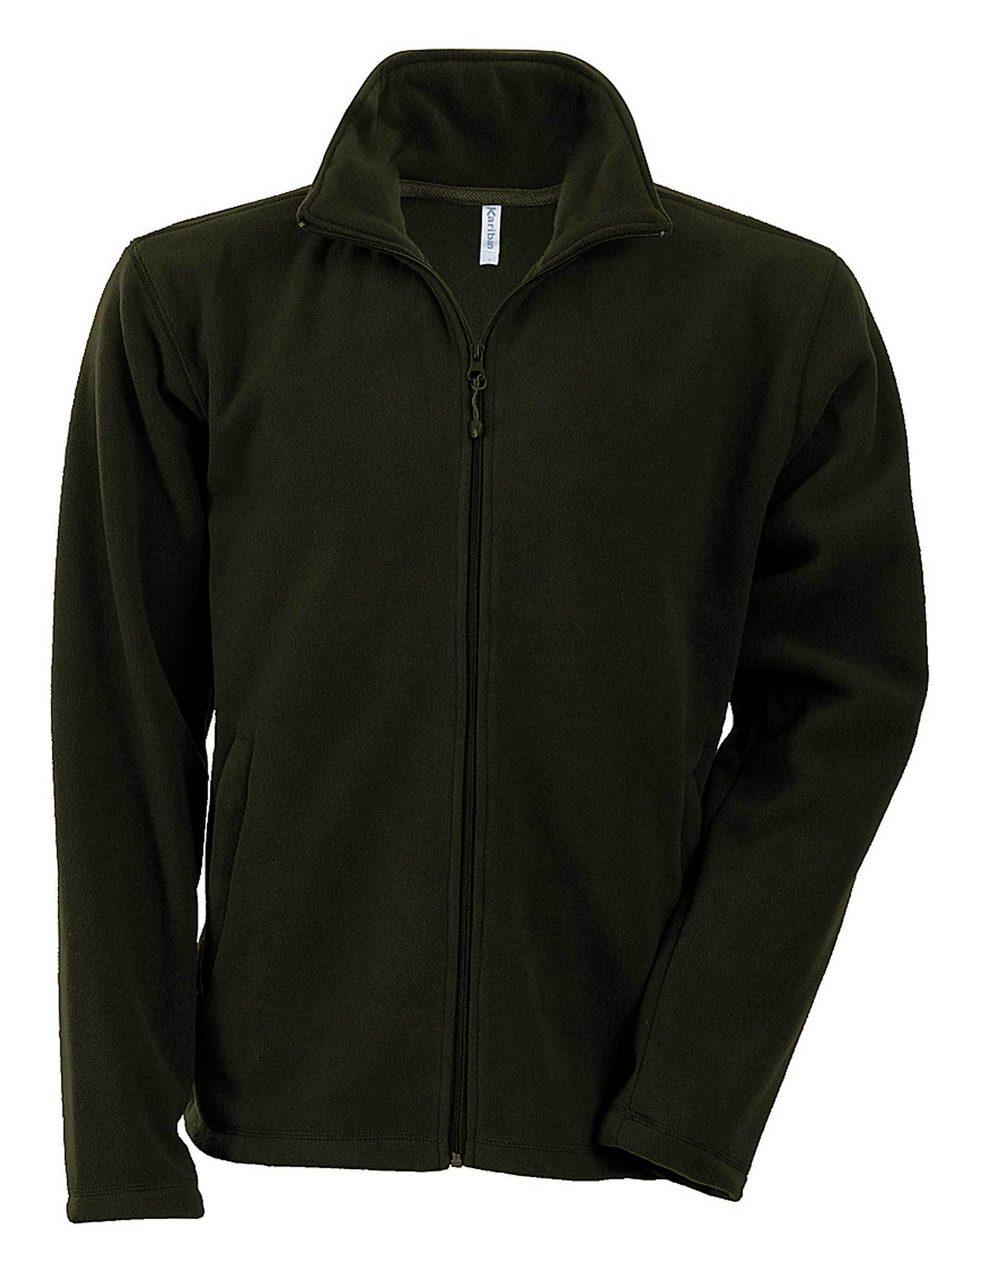 Fleece KA911 verde olive veste jachete dama barbatesti polar fleece softshell fas gluga ploaie vant broderie serigrafie termotransfer | Toroadv.ro